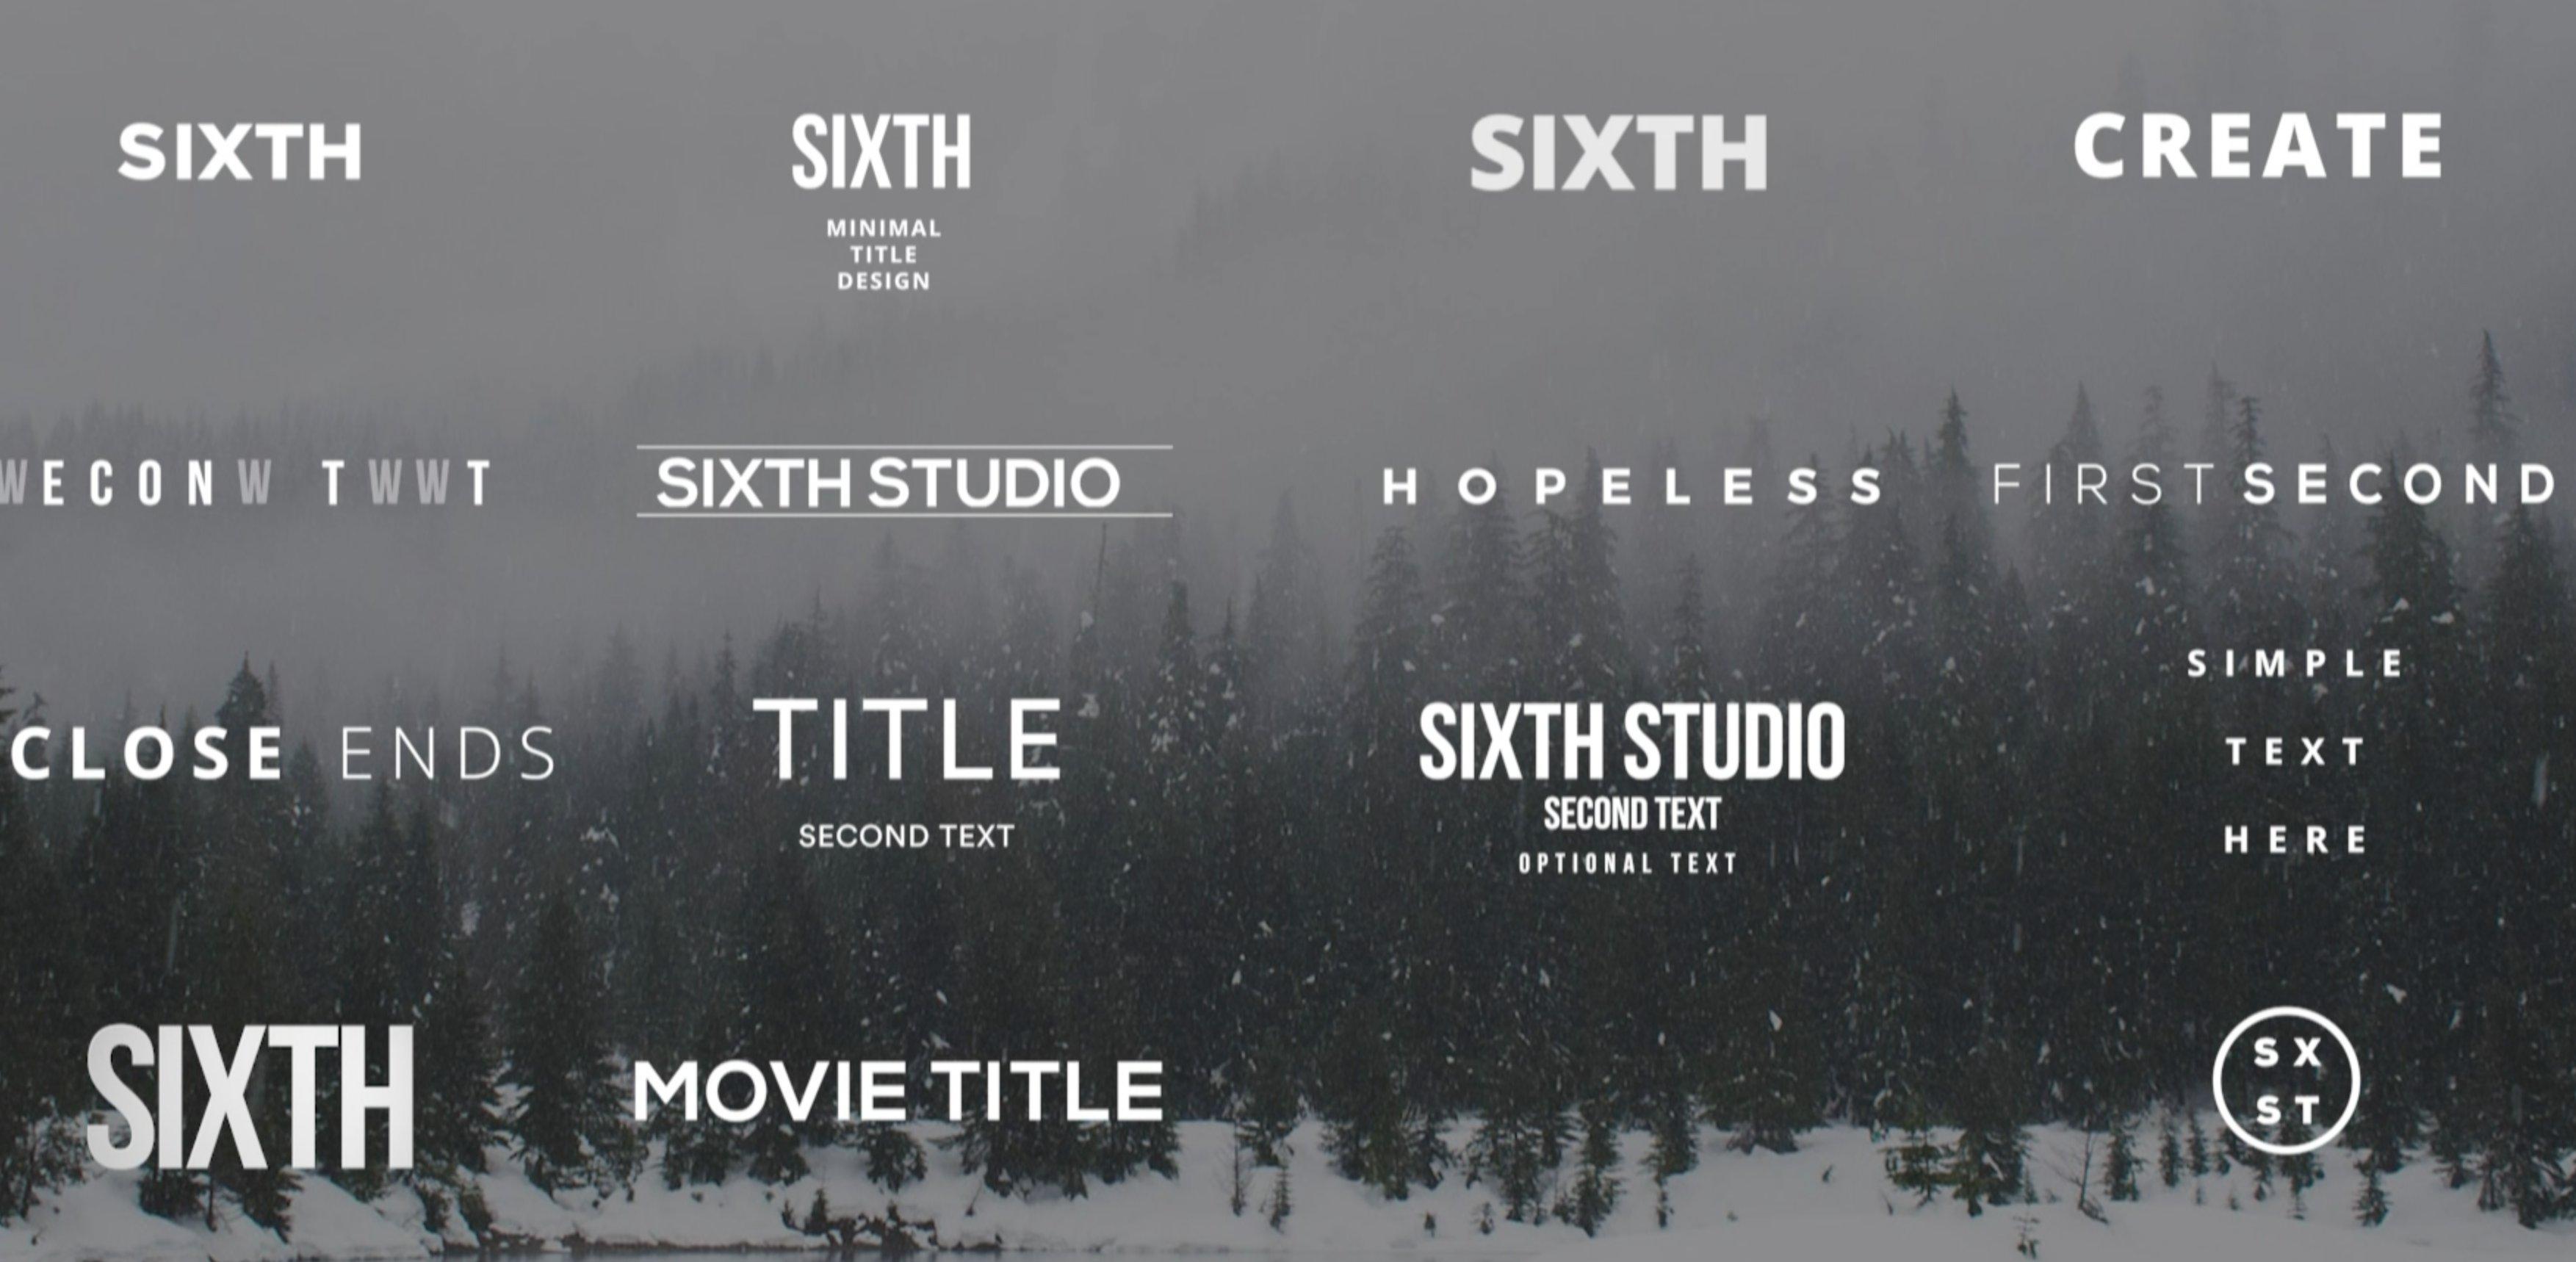 Minimalist Titles For Premiere Pro